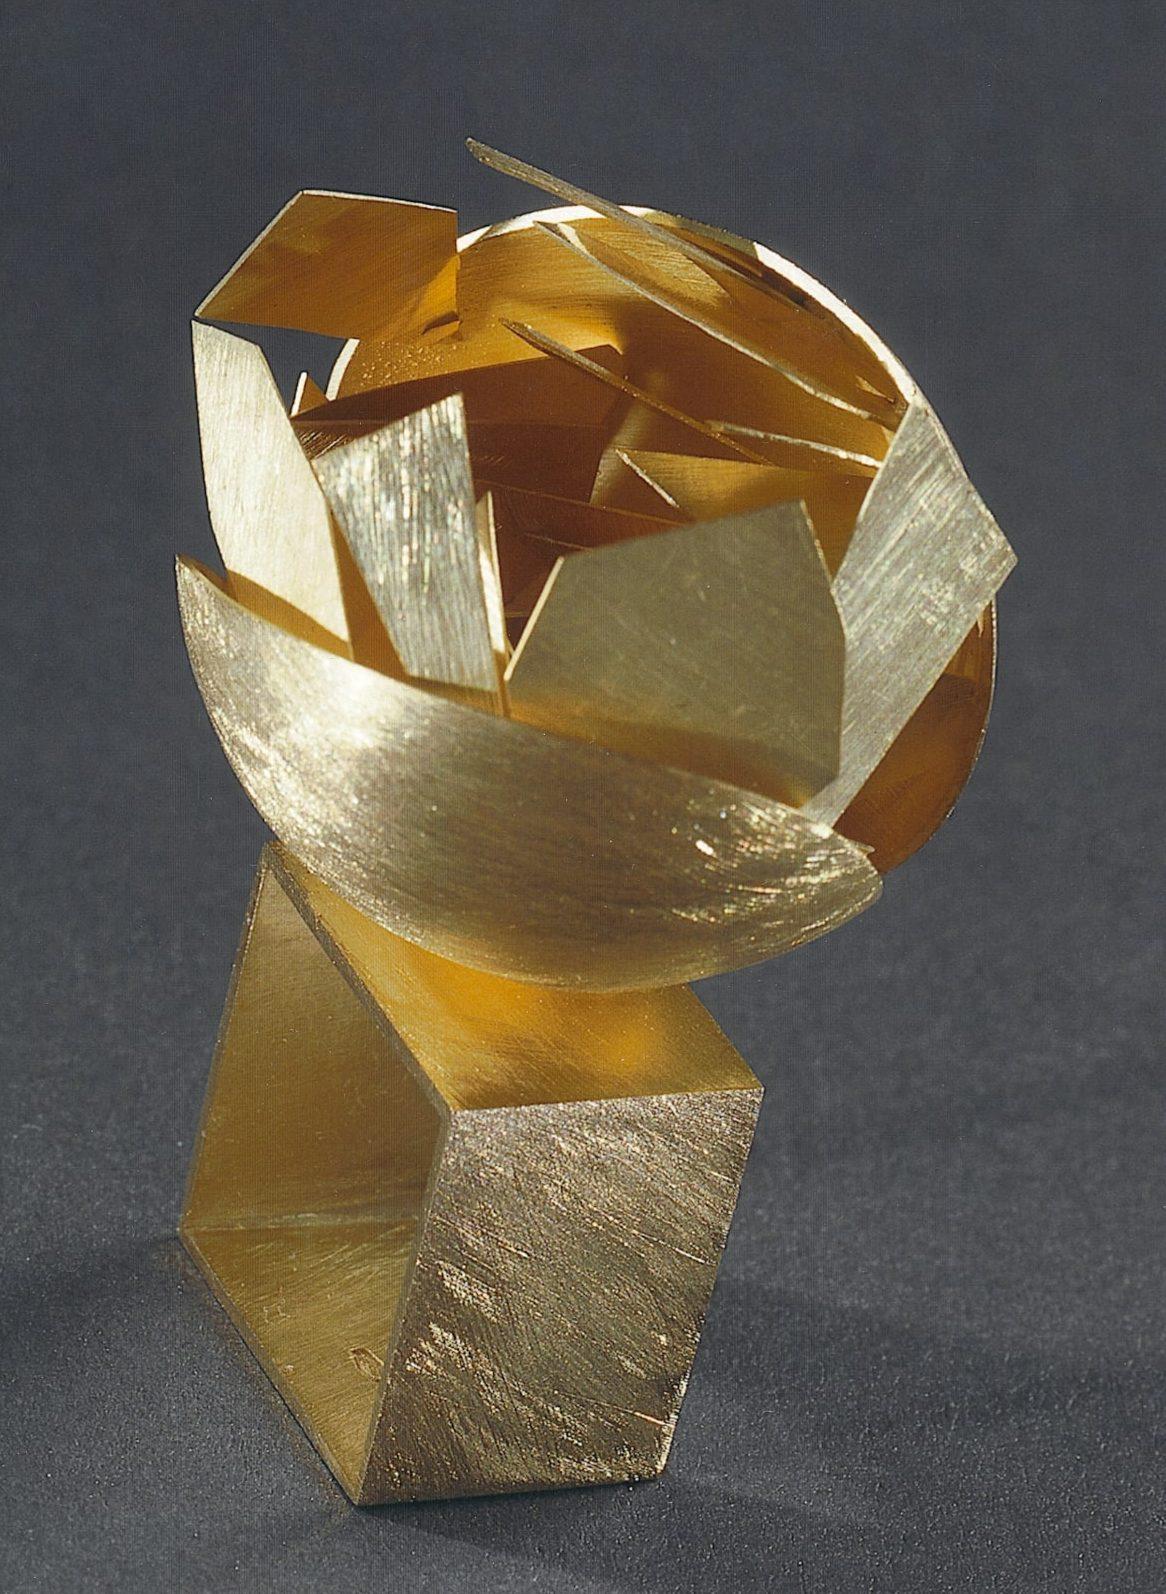 Alberto Zorzi, La Città, ring, 2003, goud